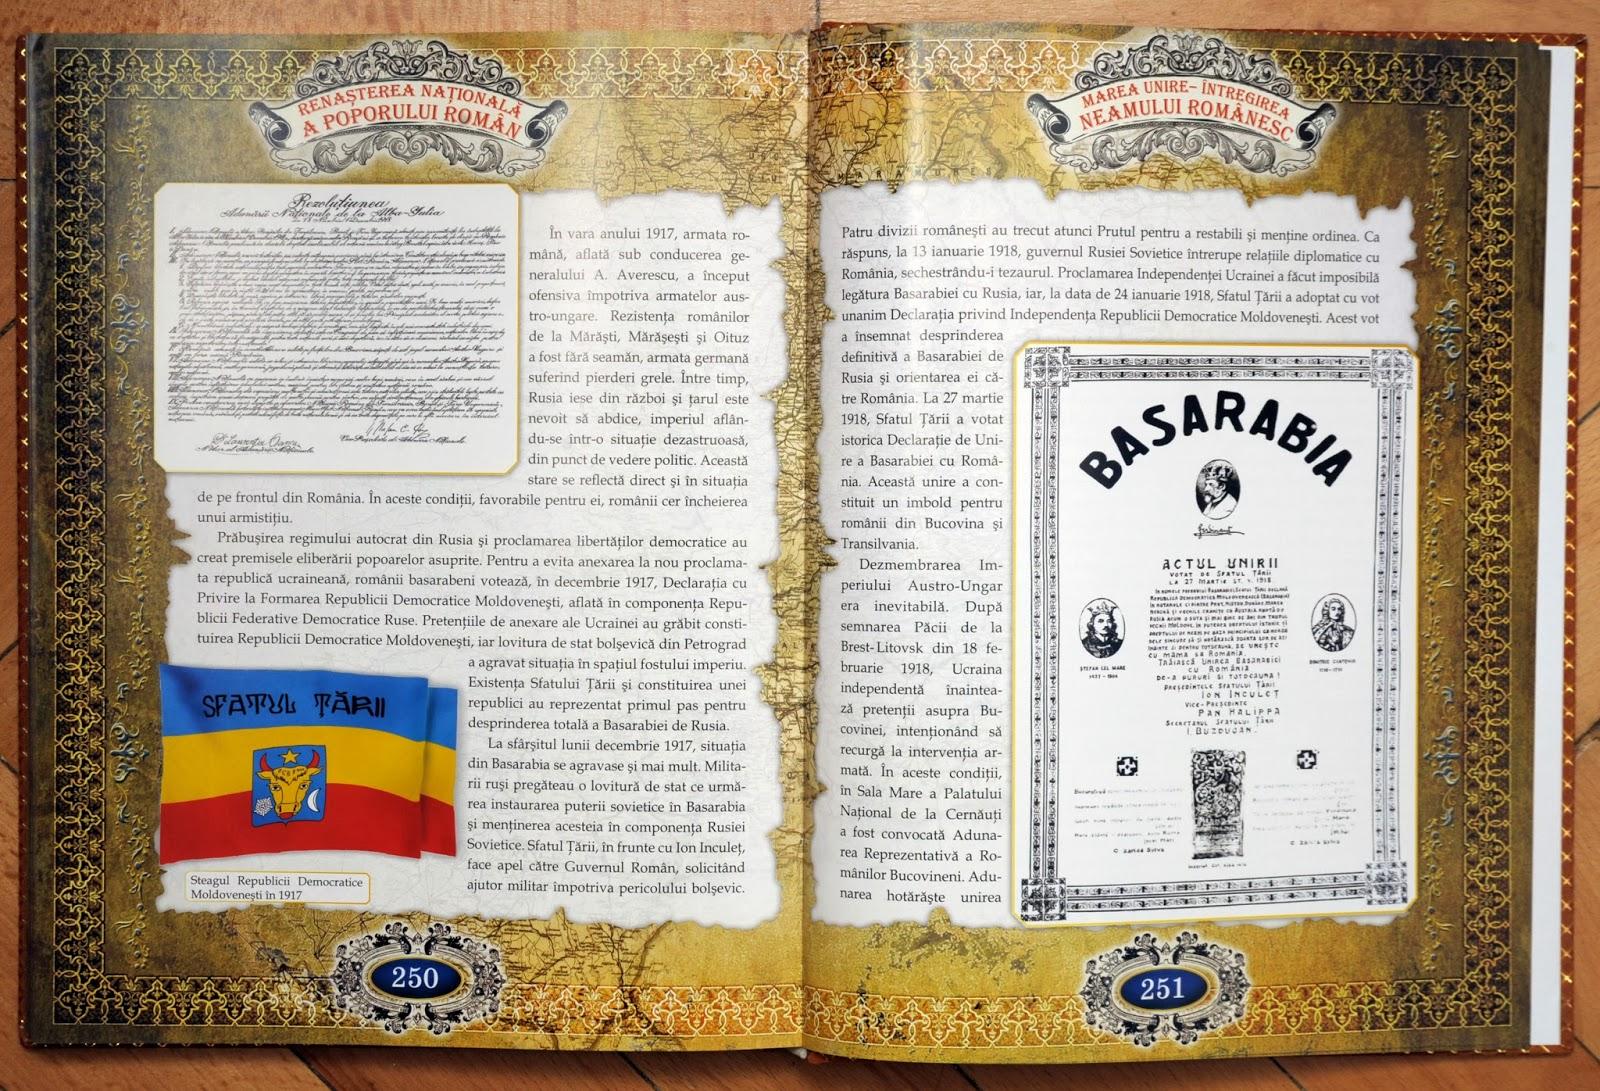 Istoria neamului romanesc - act unire fotocopiat